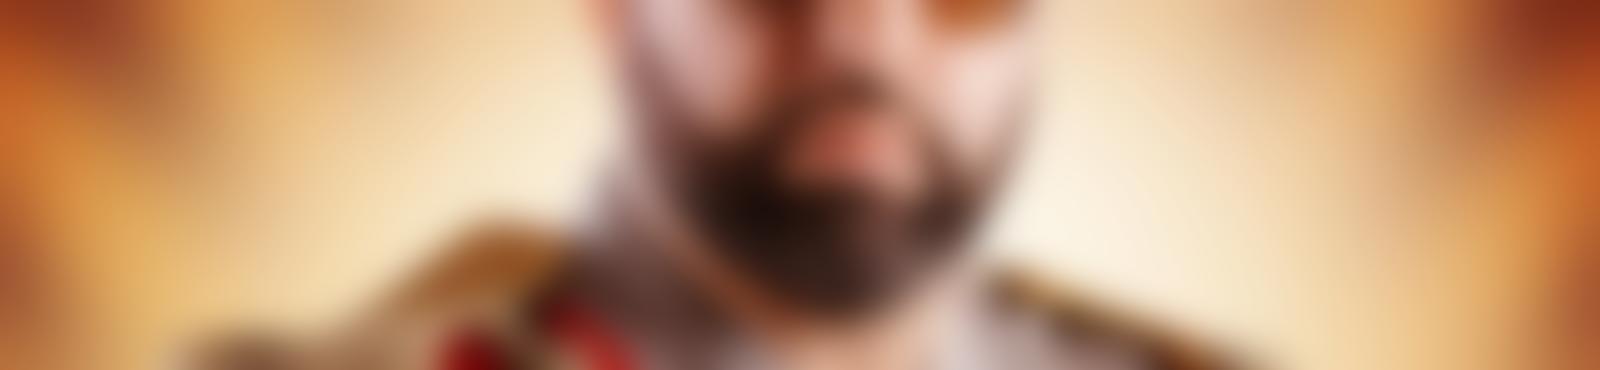 Blurred 2c8c7f1e 7c36 487f b1e4 8d9e3824e464